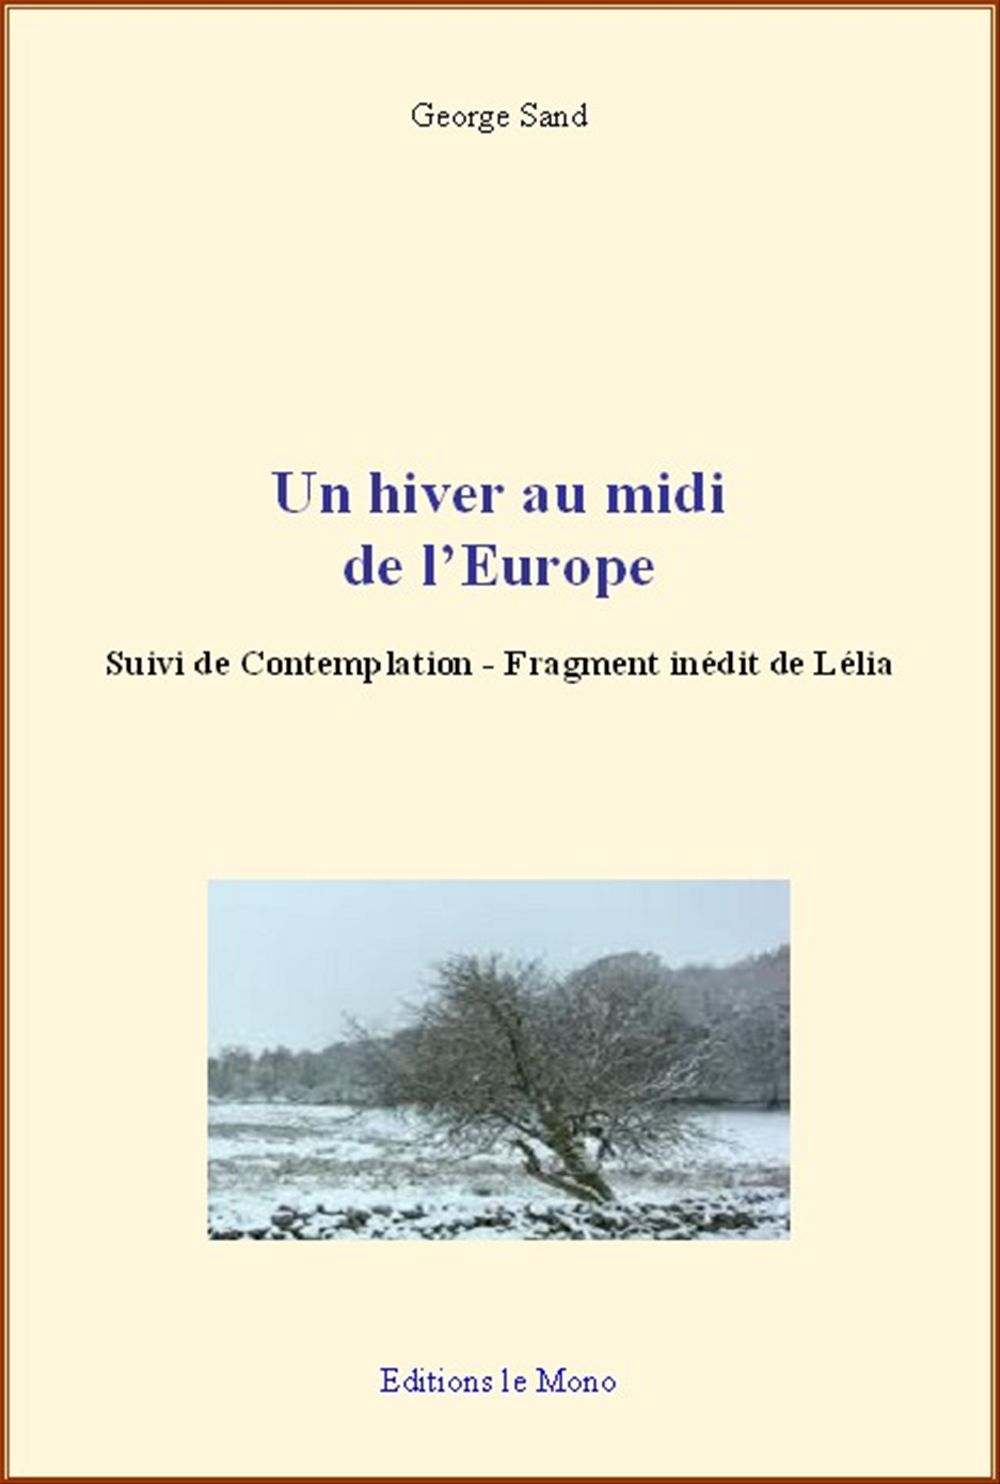 Un hiver au midi de l'Europe